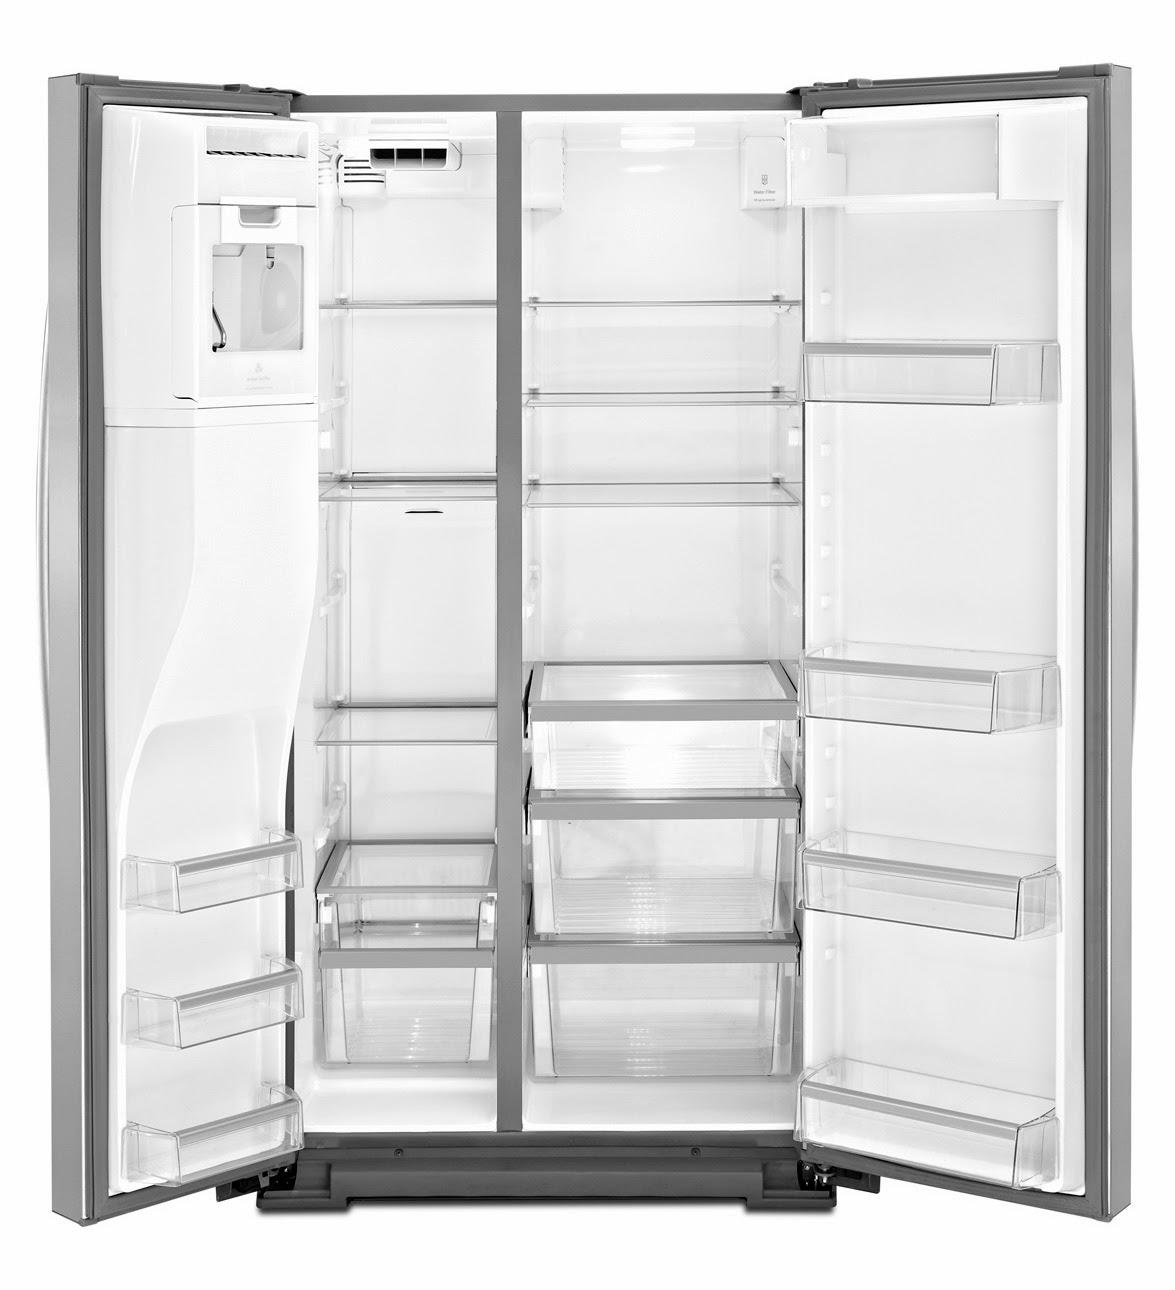 Whirlpool Refrigerator Brand Whirlpool Wrs537siaw